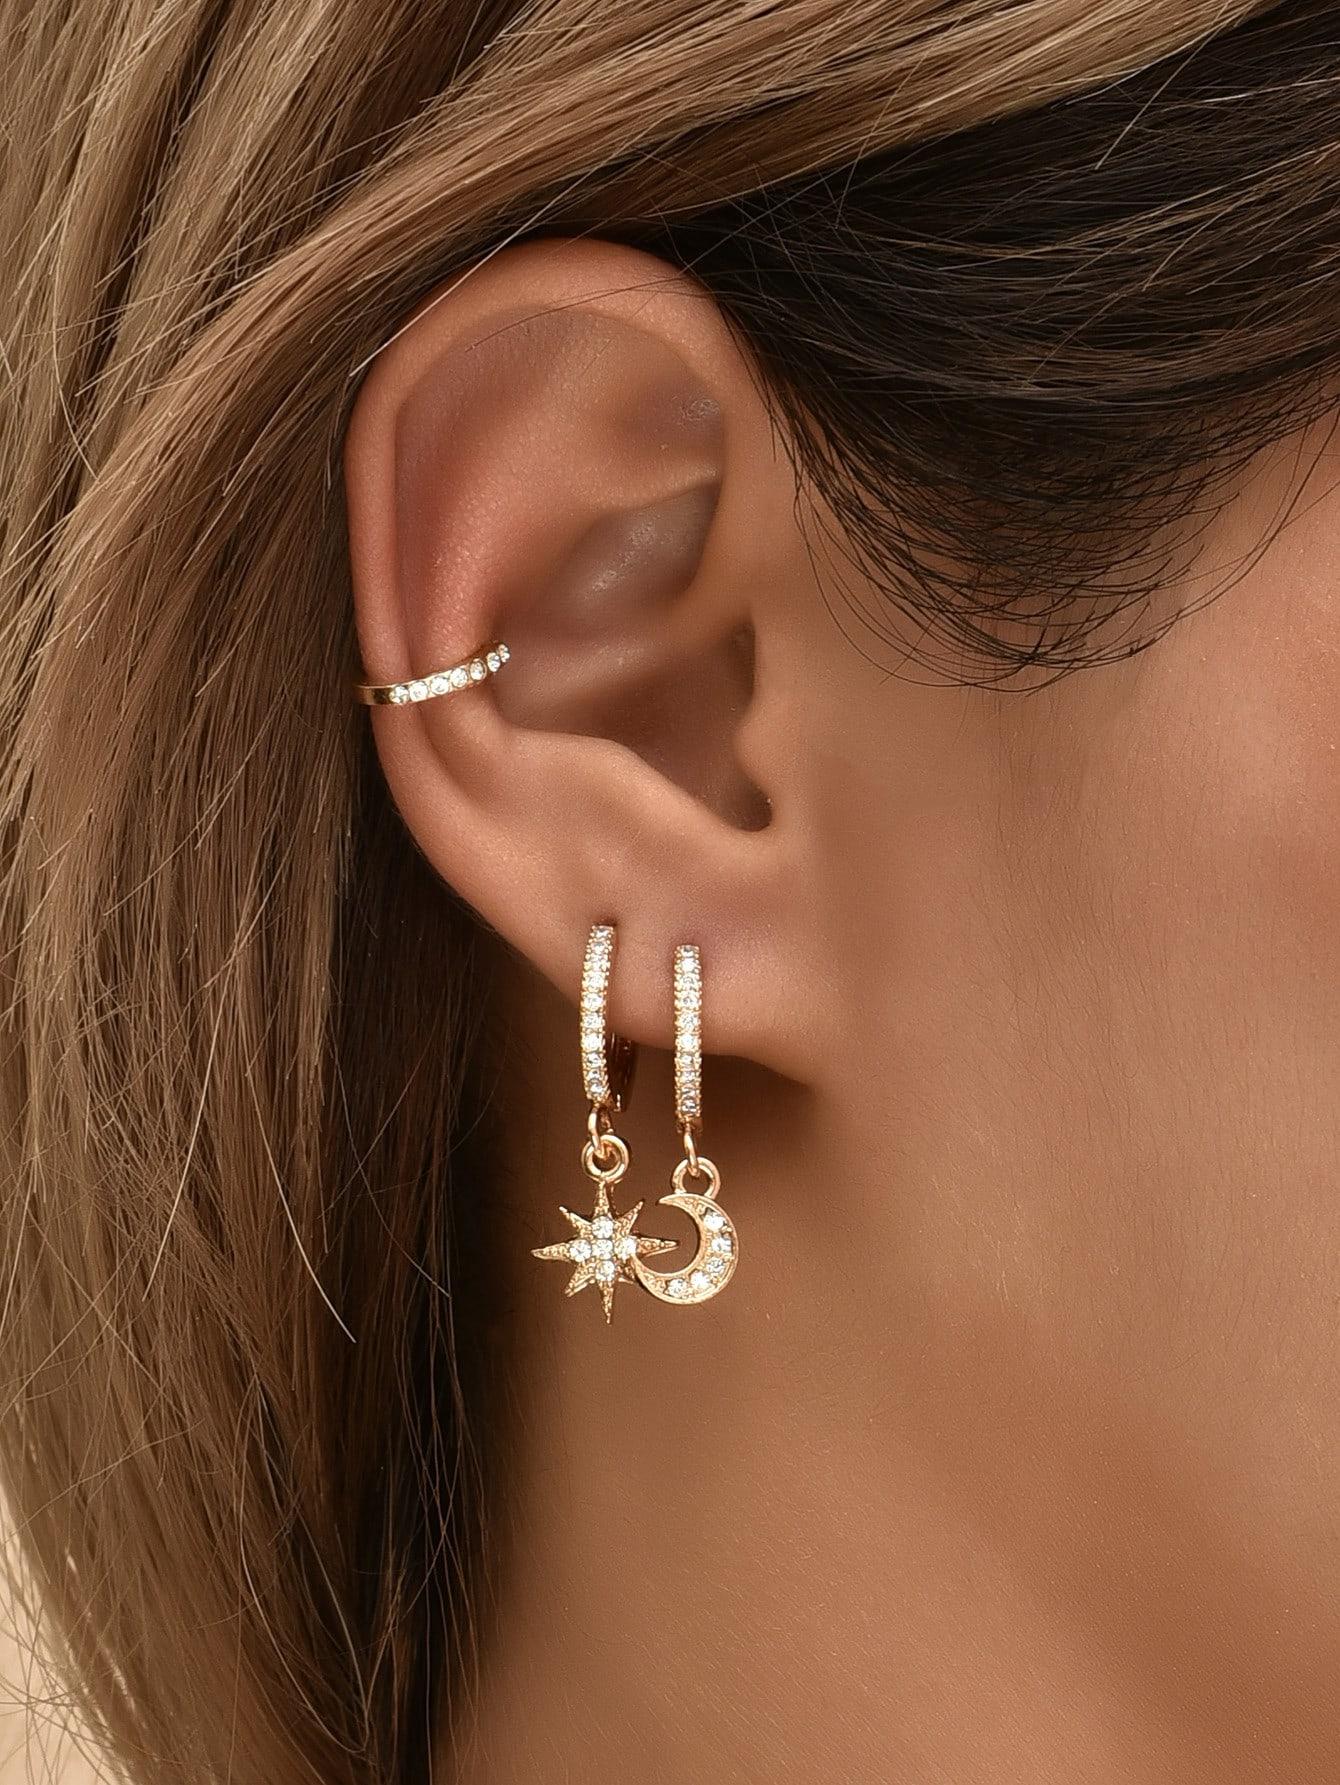 3pcs Rhinestone Decor Moon Charm Earring thumbnail